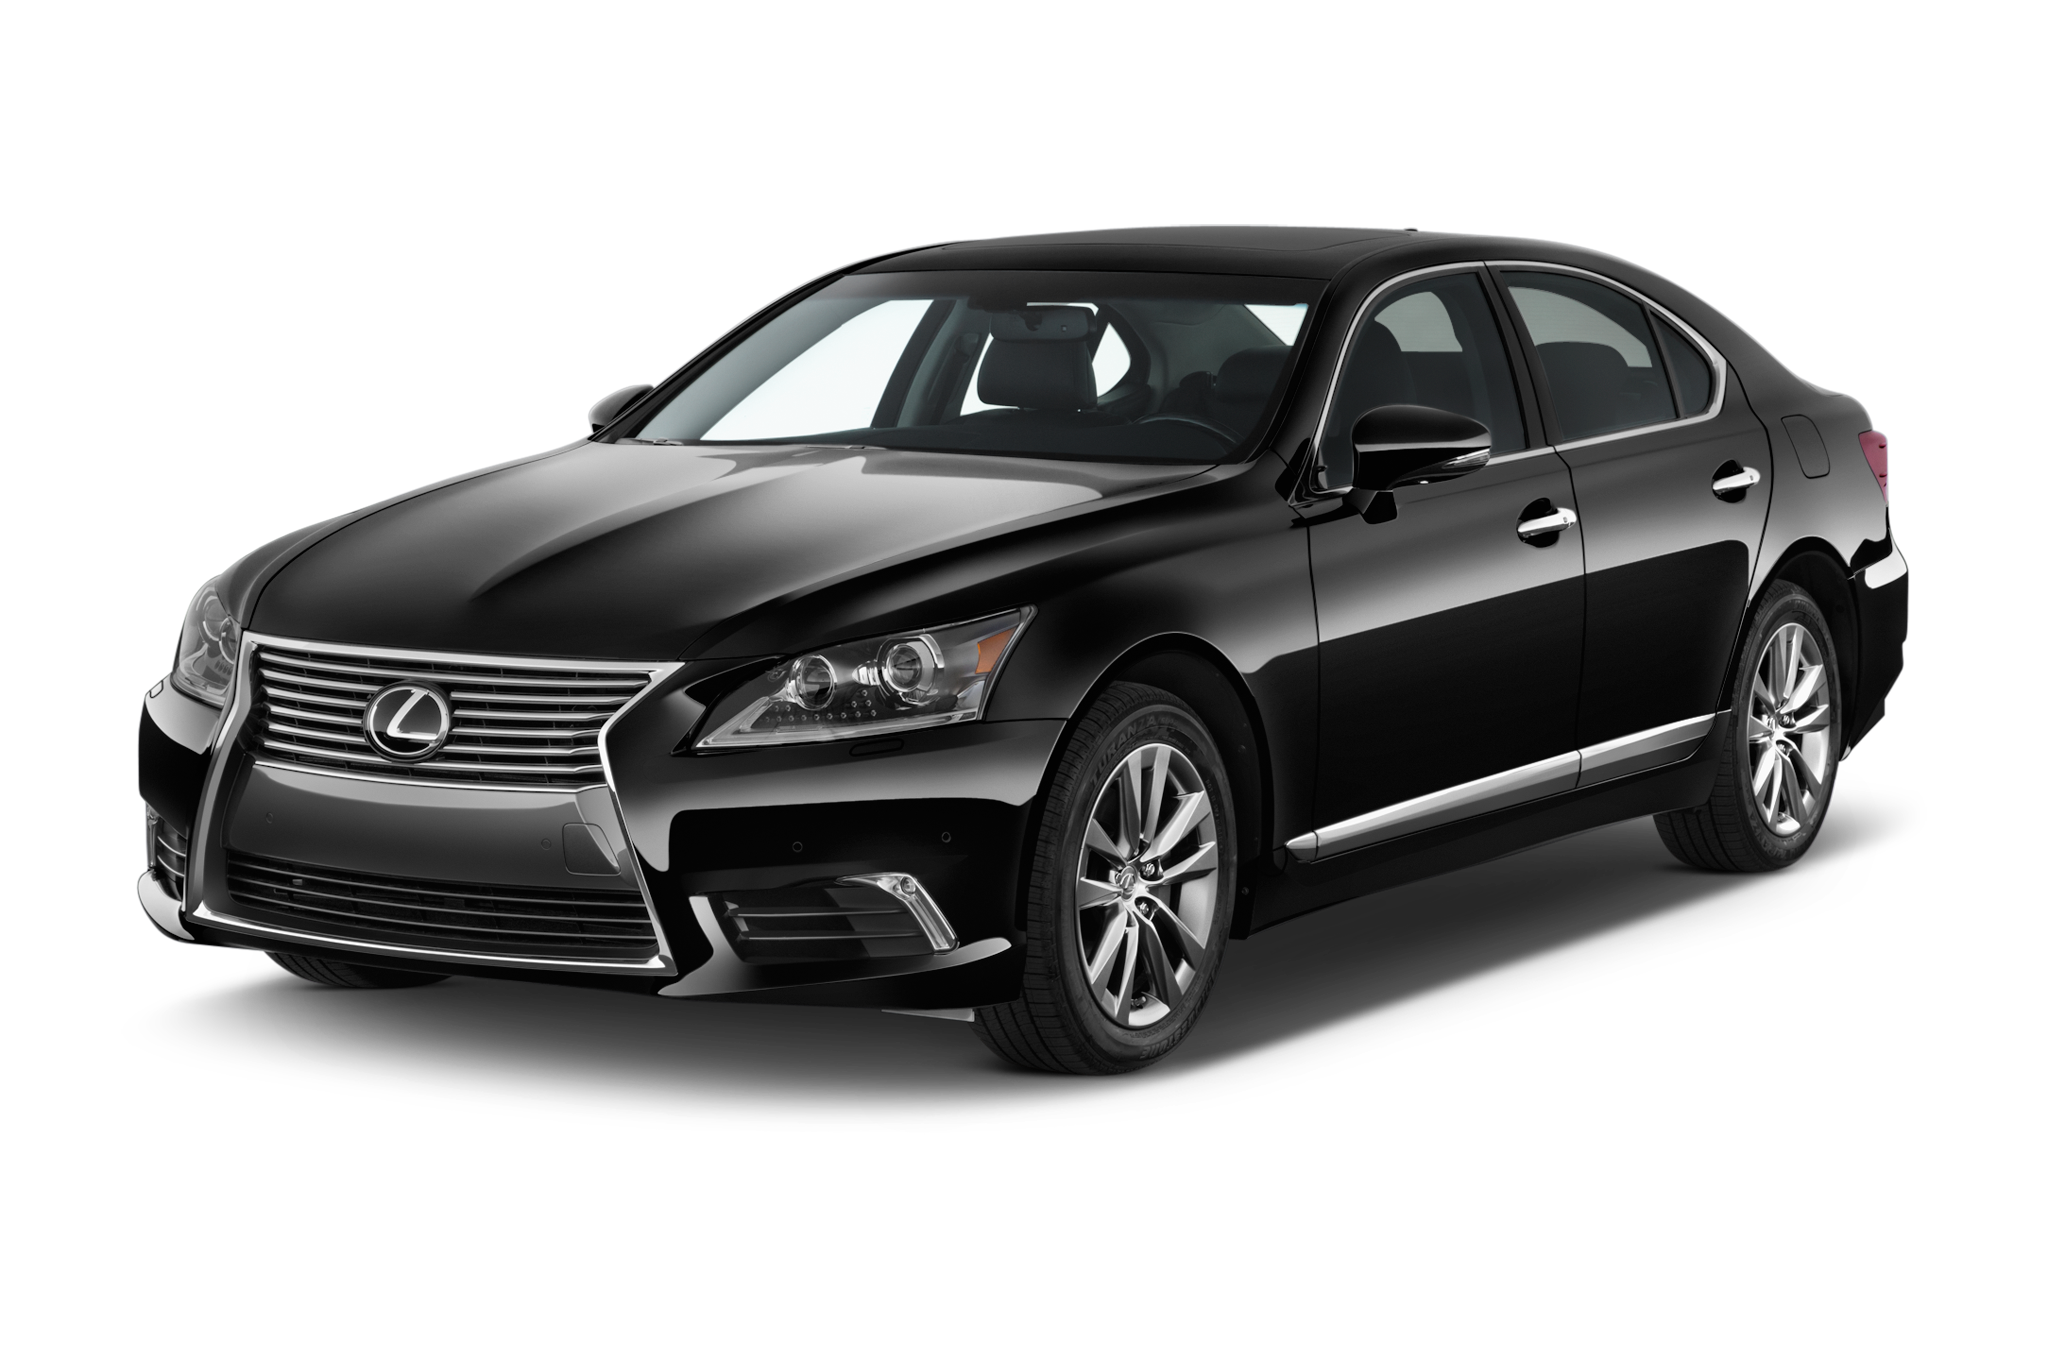 Lexus LS 2015 - International Price & Overview